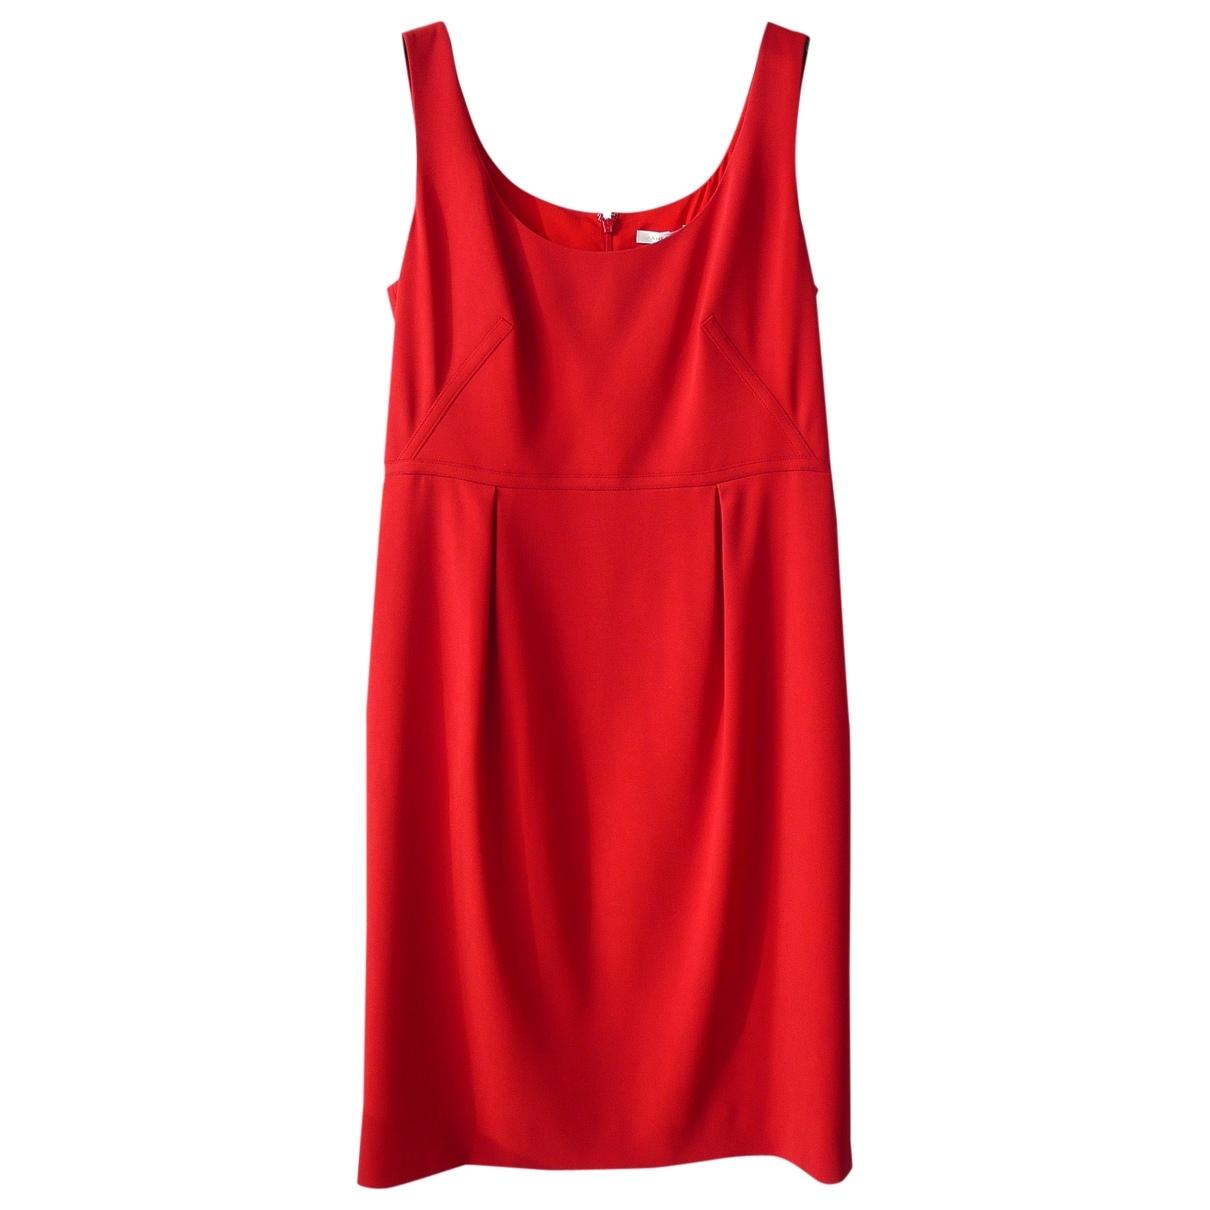 Paule Ka \N Red dress for Women 42 FR